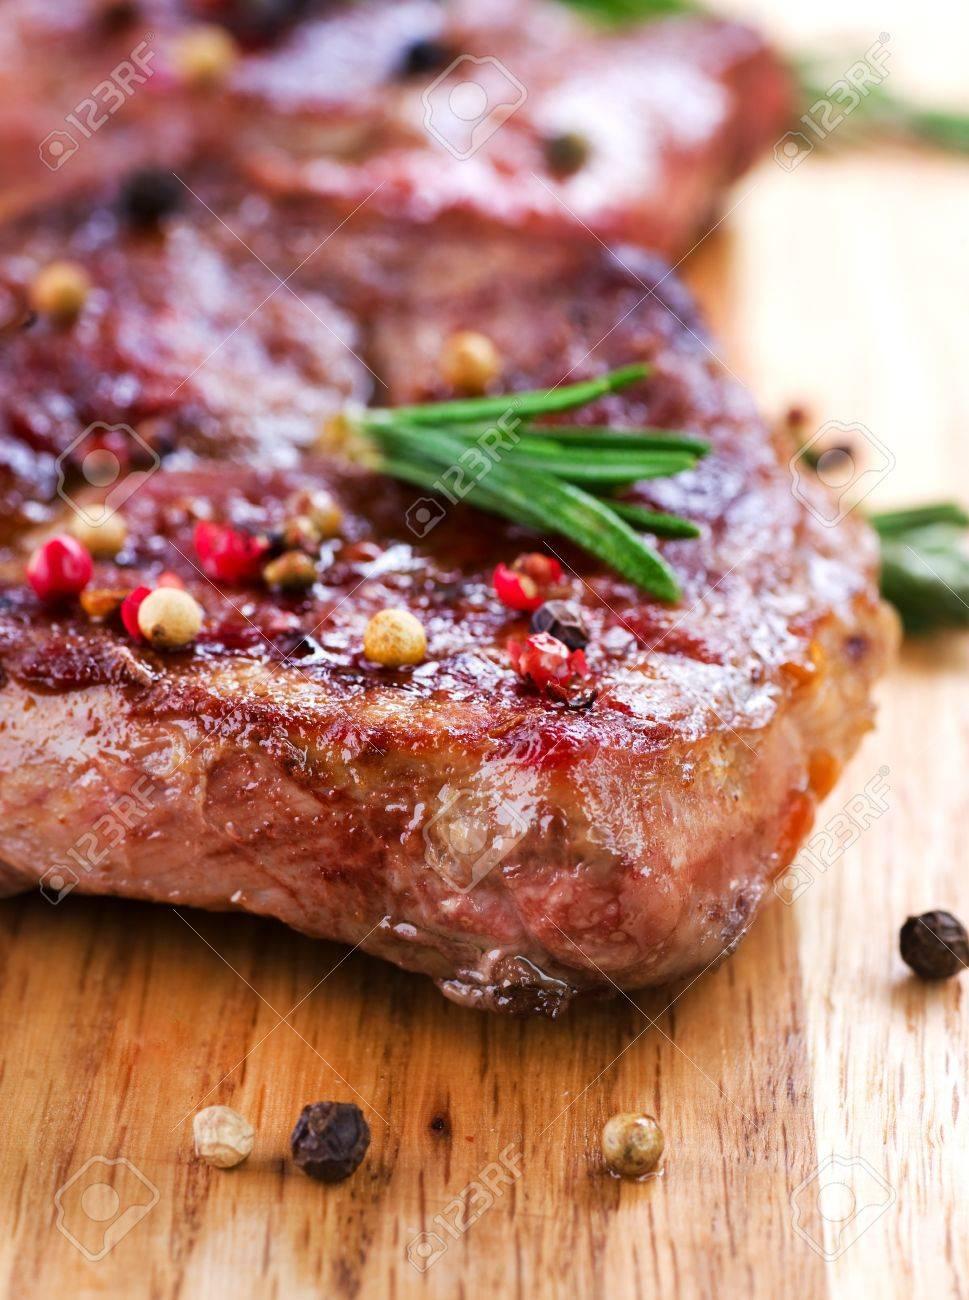 Beef Steak Stock Photo - 12382070